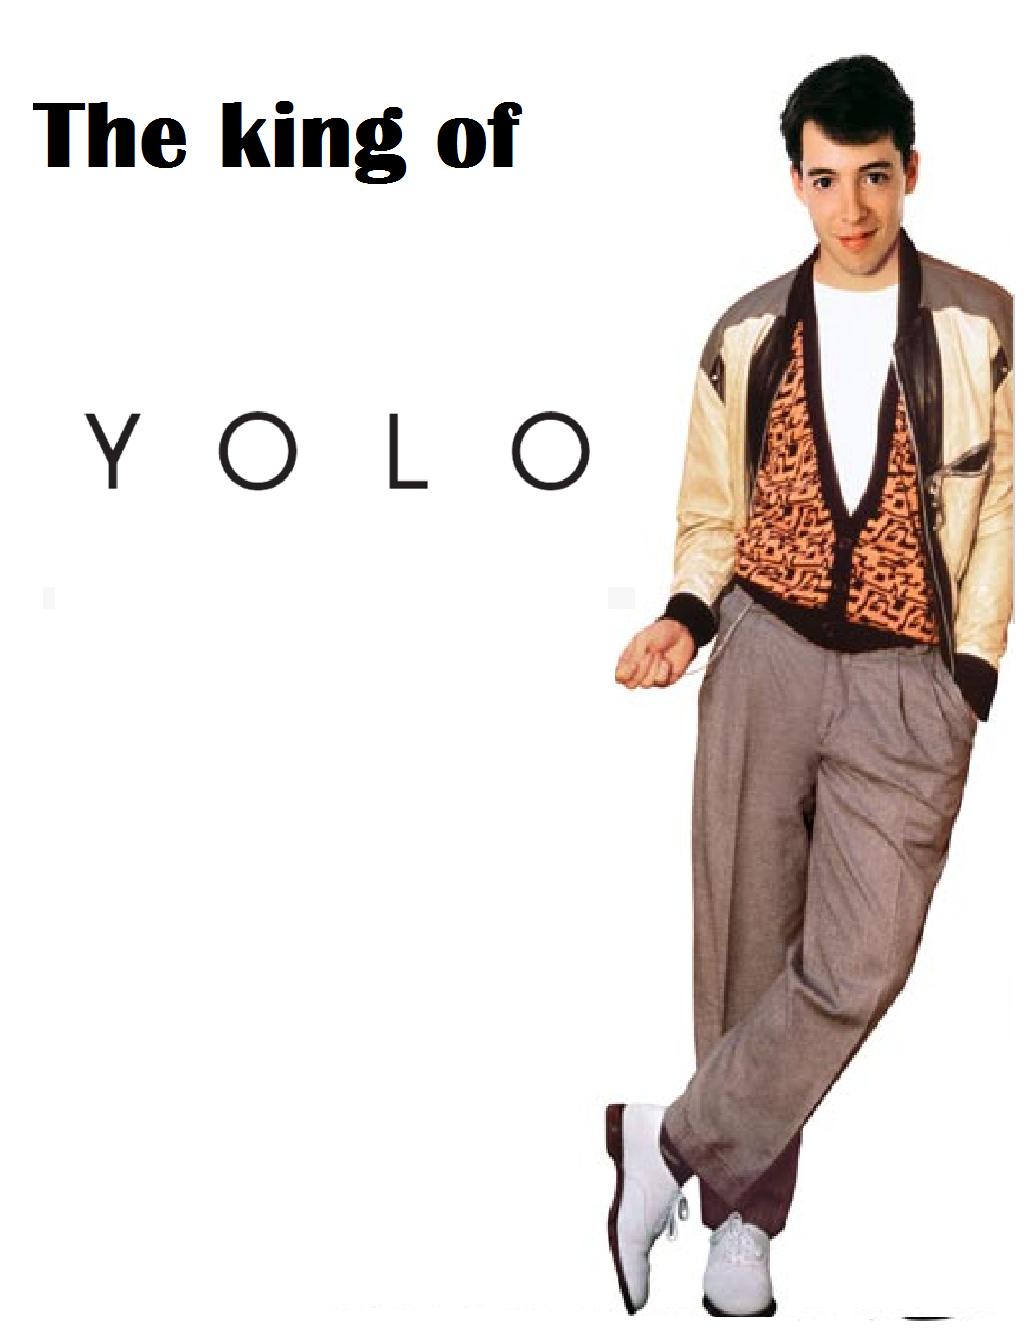 King of YOLO